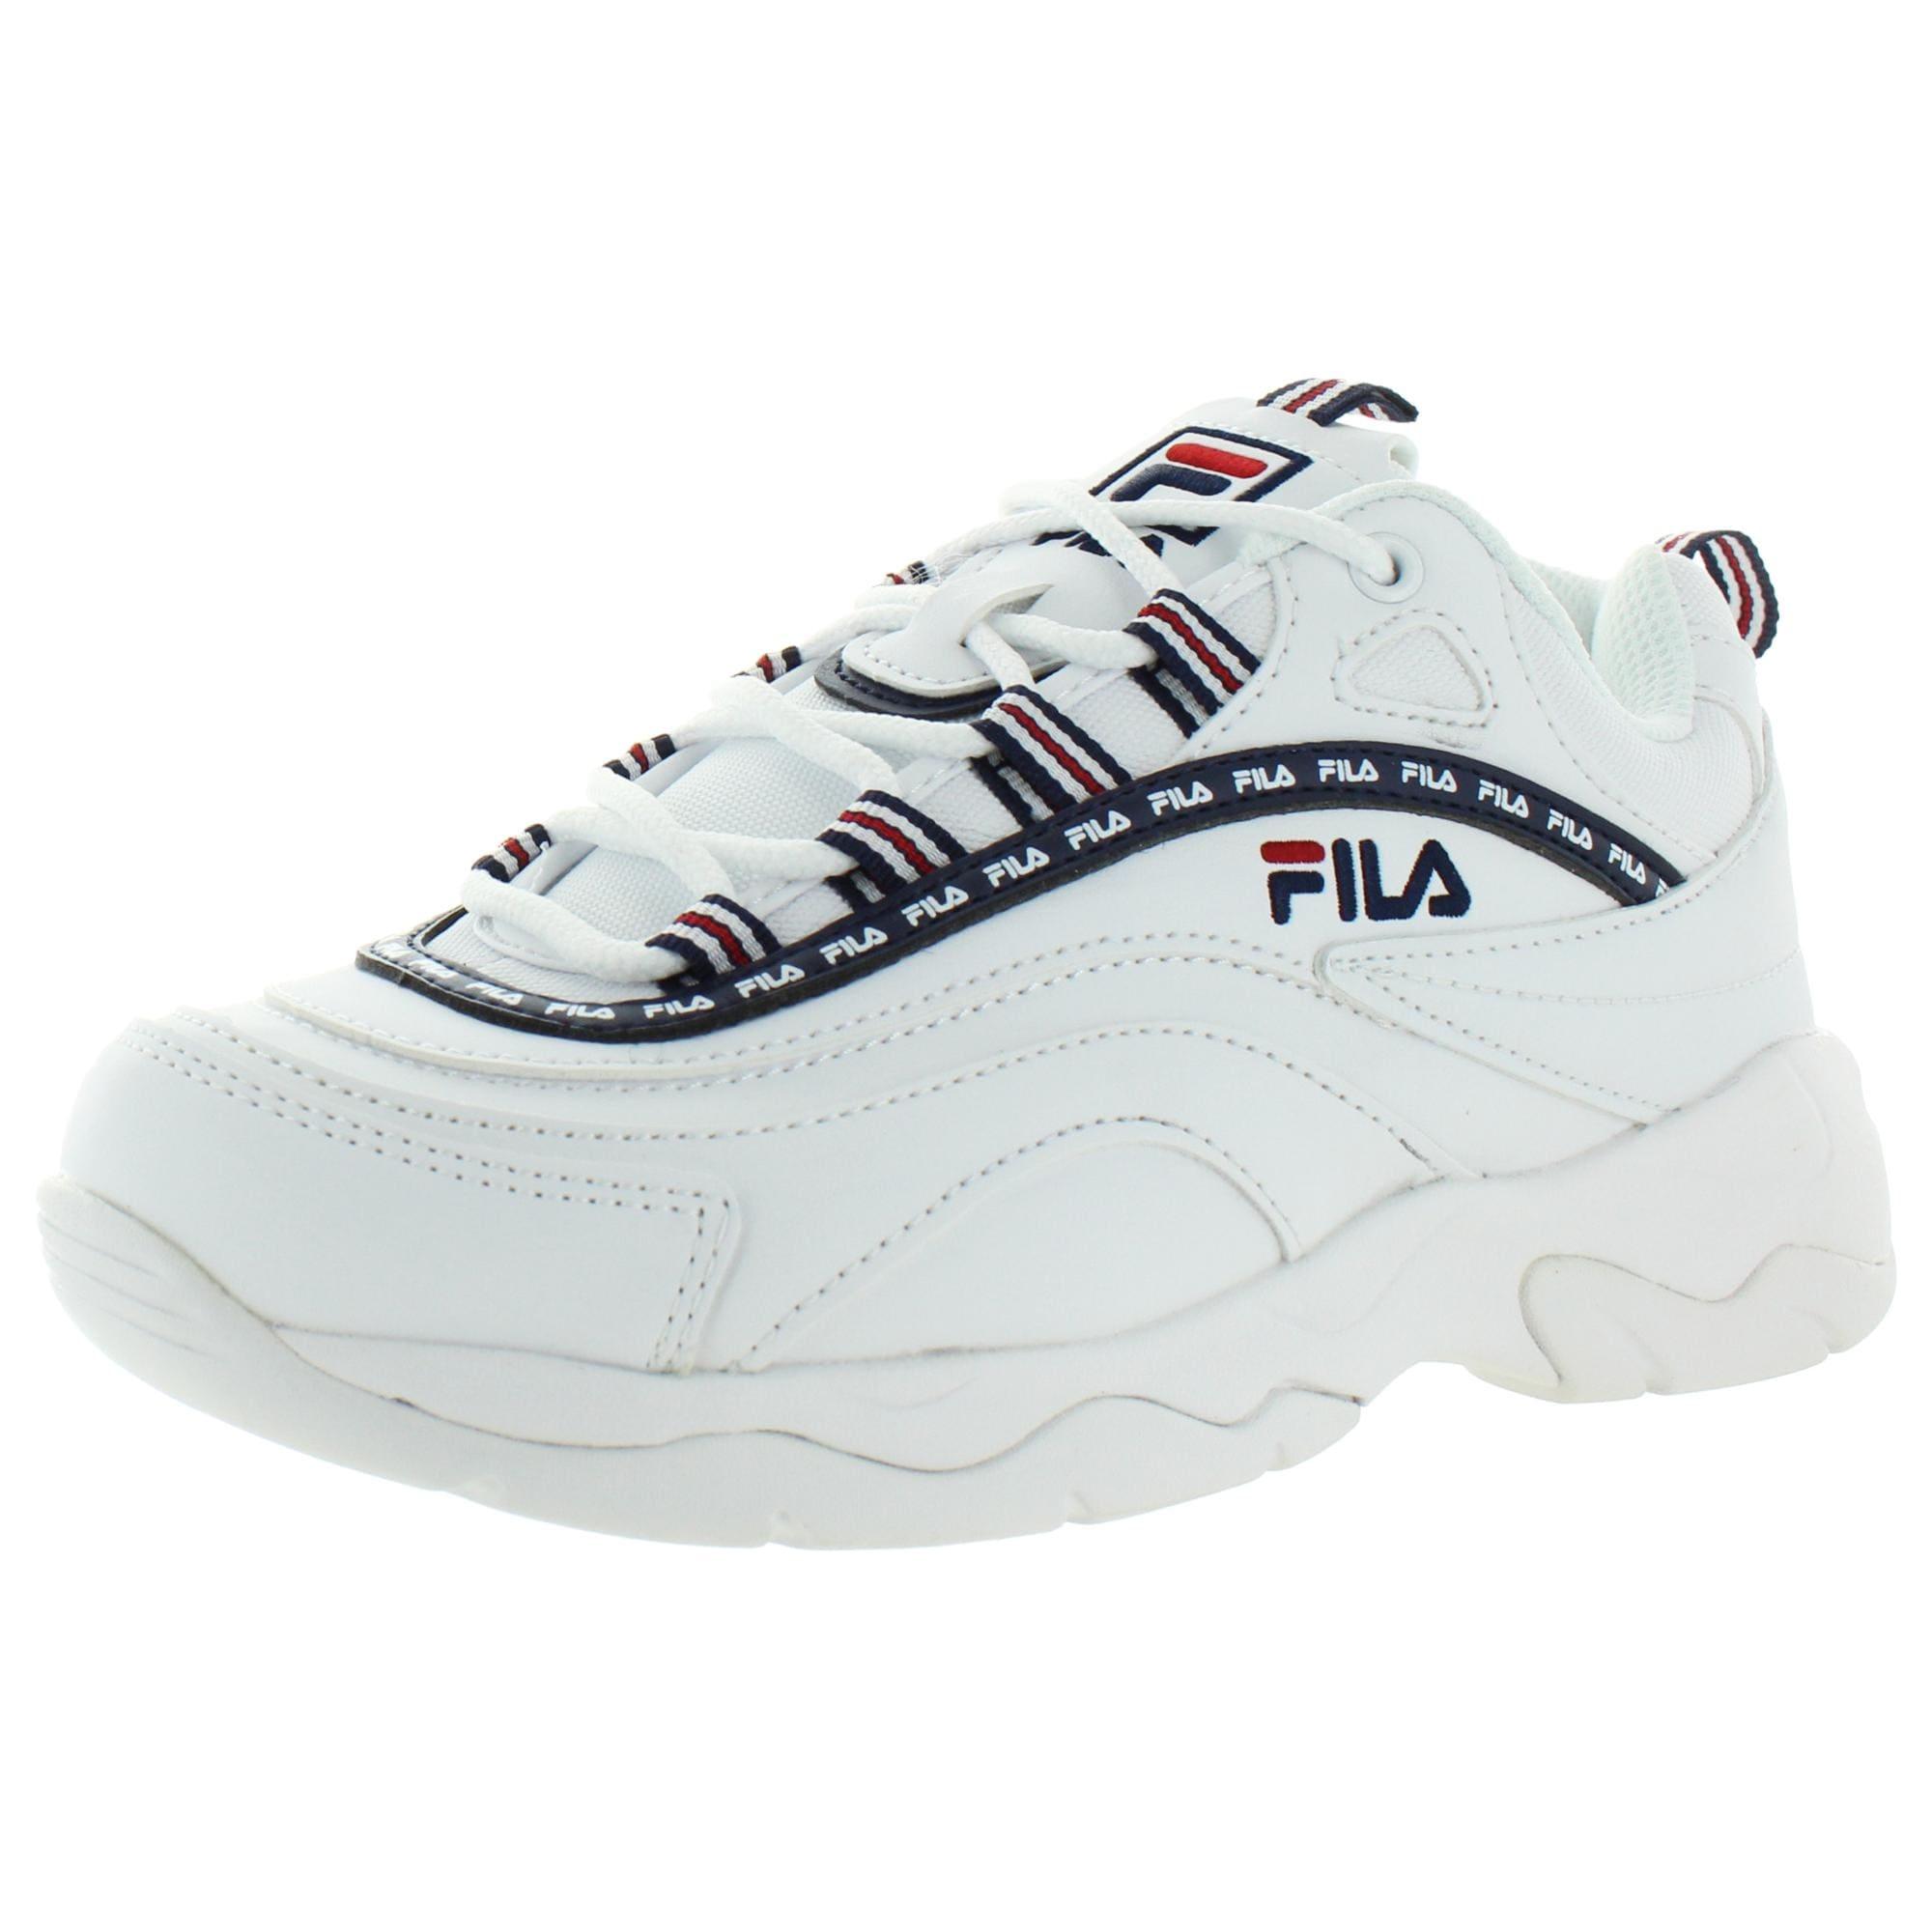 Shop Black Friday Deals on Fila Womens